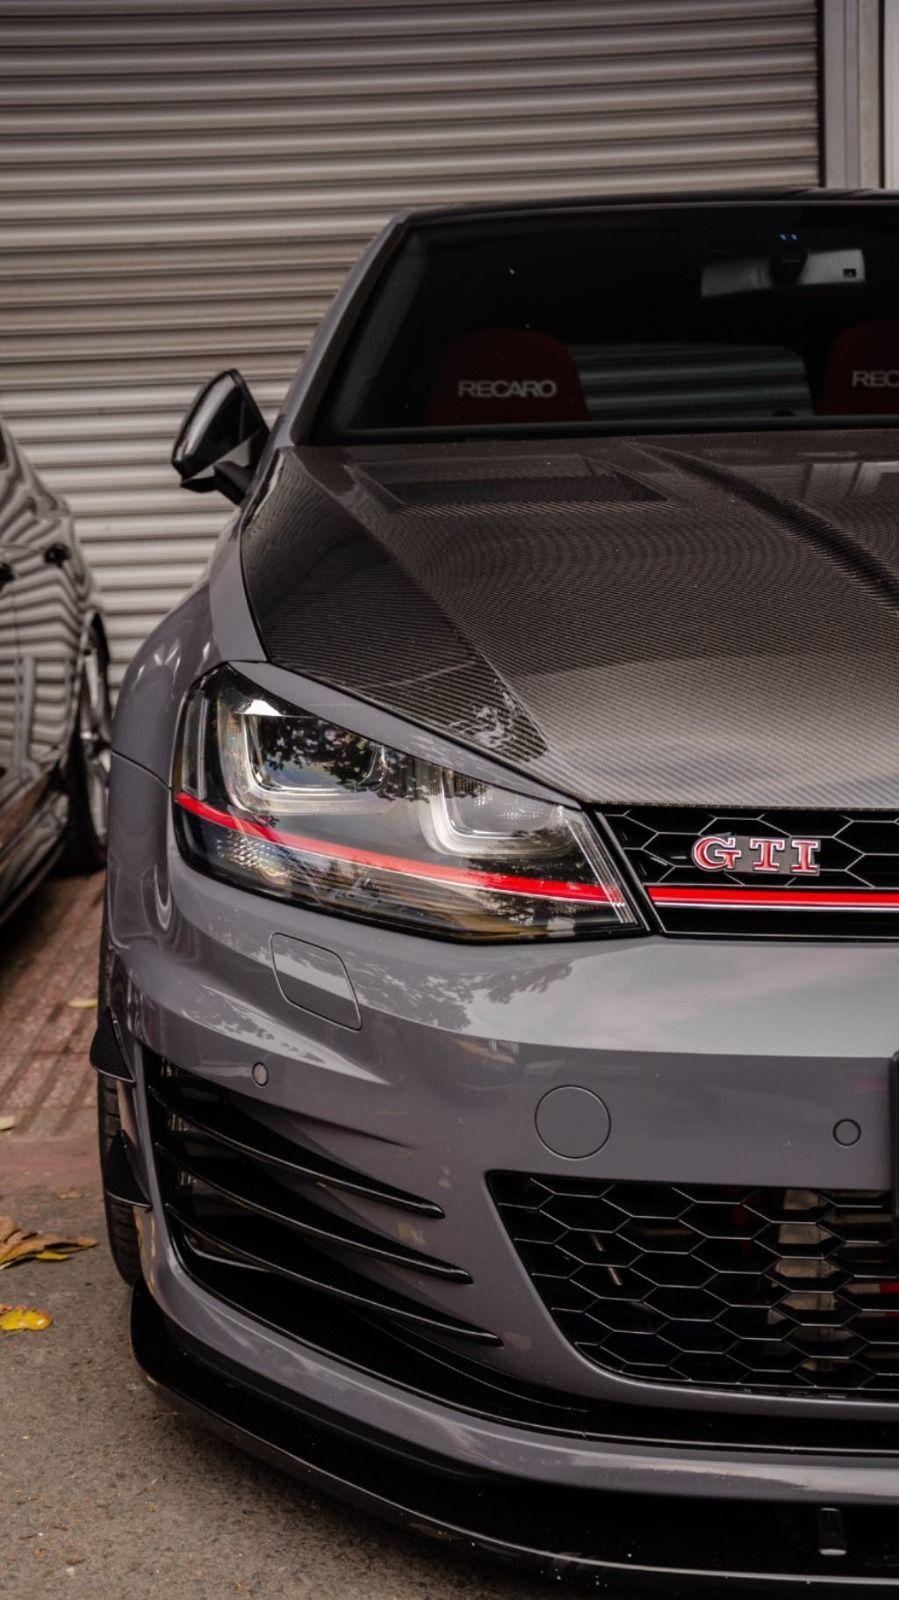 Emf Golf Gti Carros De Luxo Acessorios Para Carros Super Carros